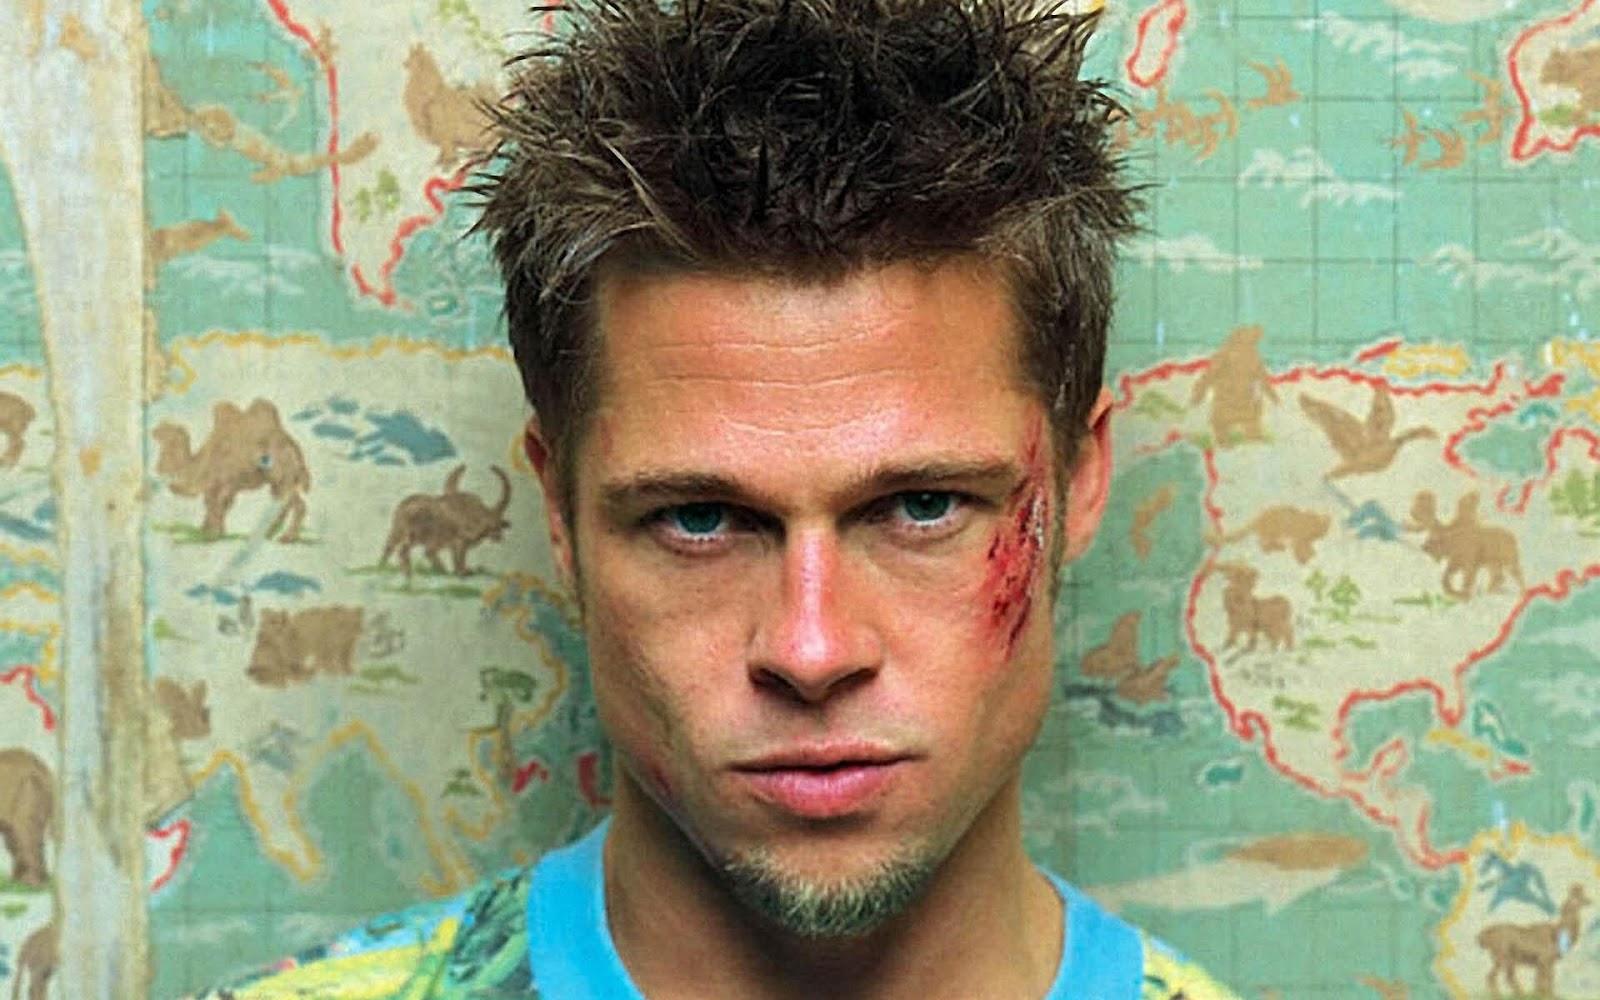 Brad Pitt Hd Wallpapers: My HD Pictures: Brad Pitt HD Pictures & Wallpapers